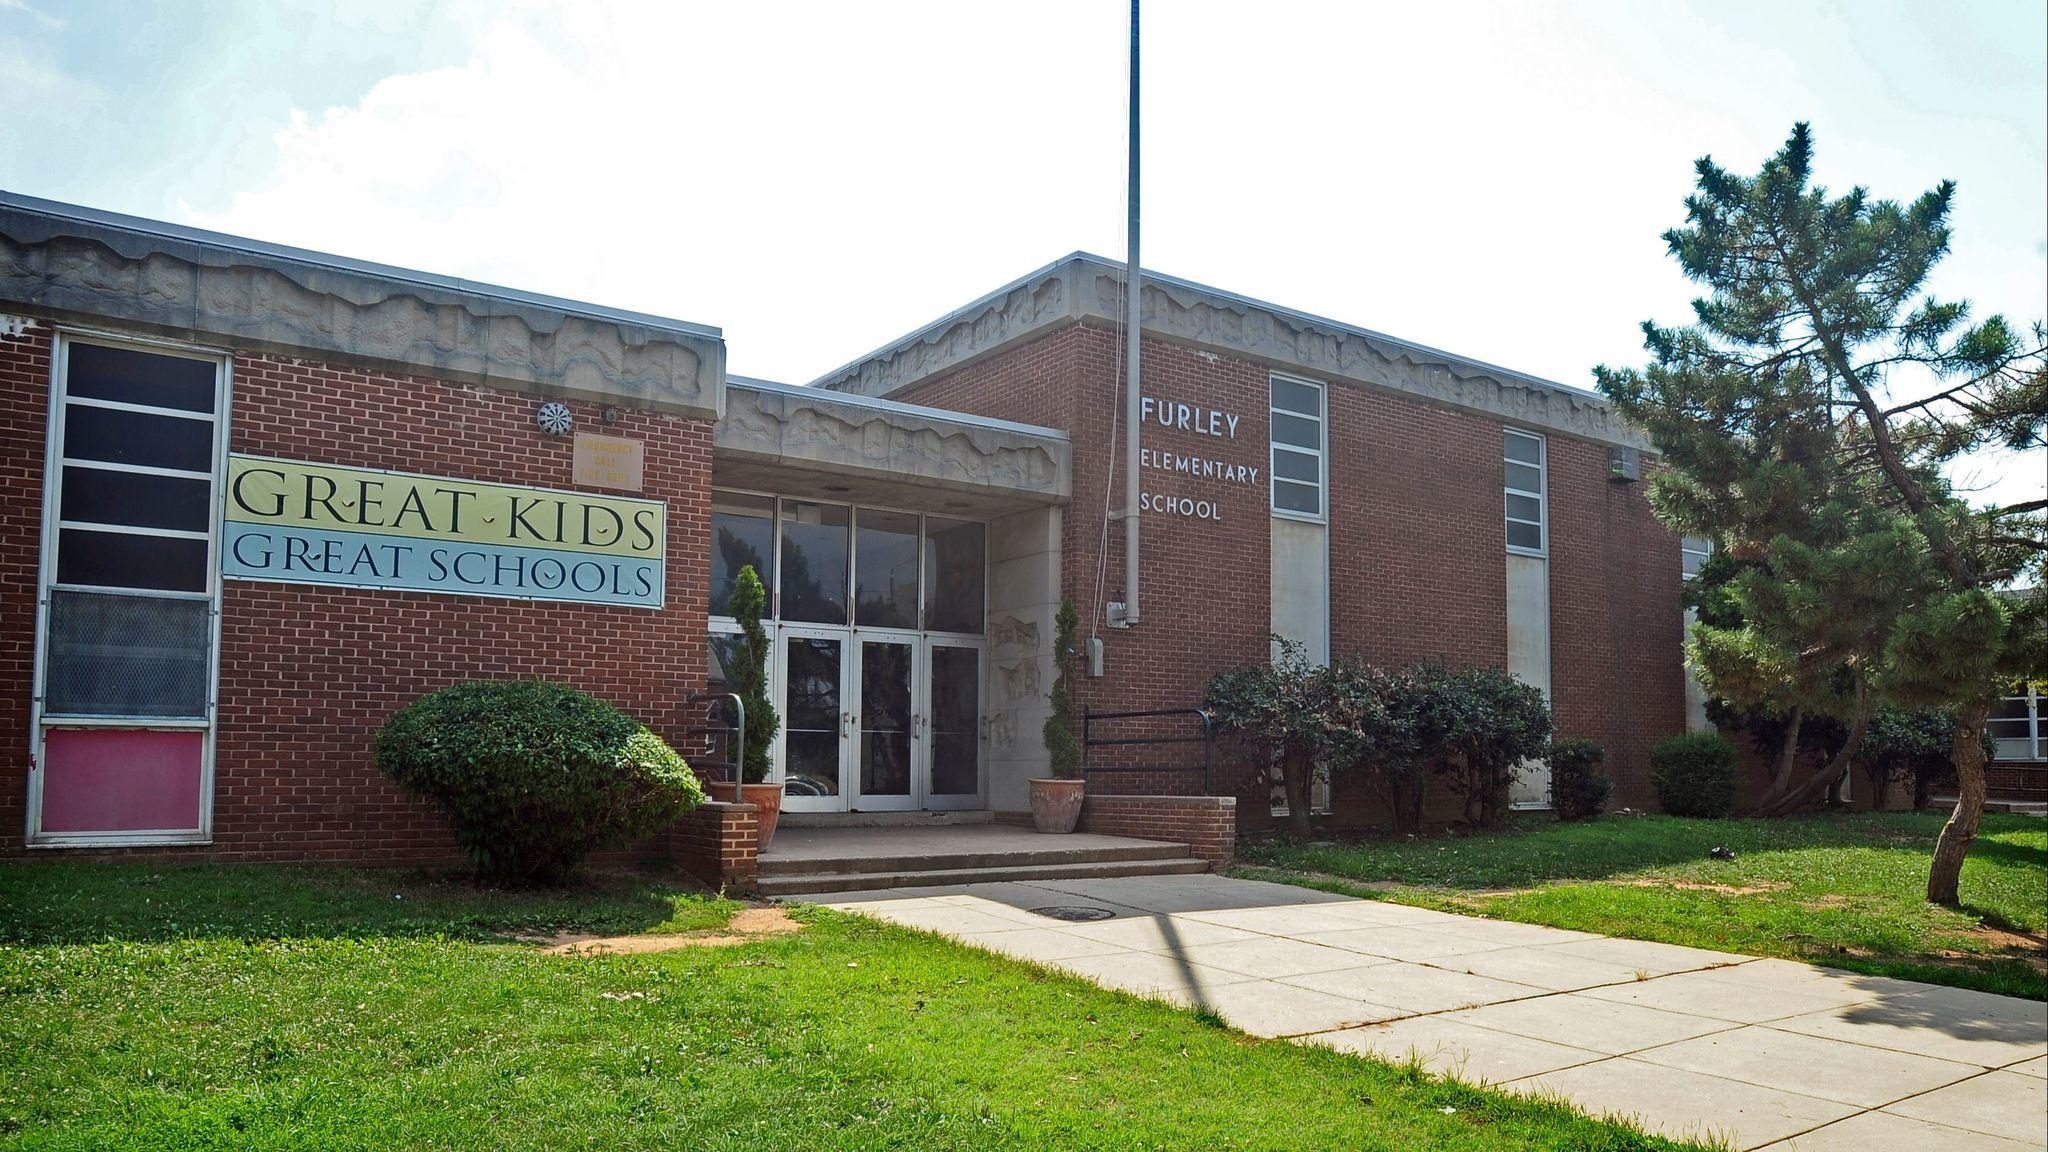 Furley Elementary School